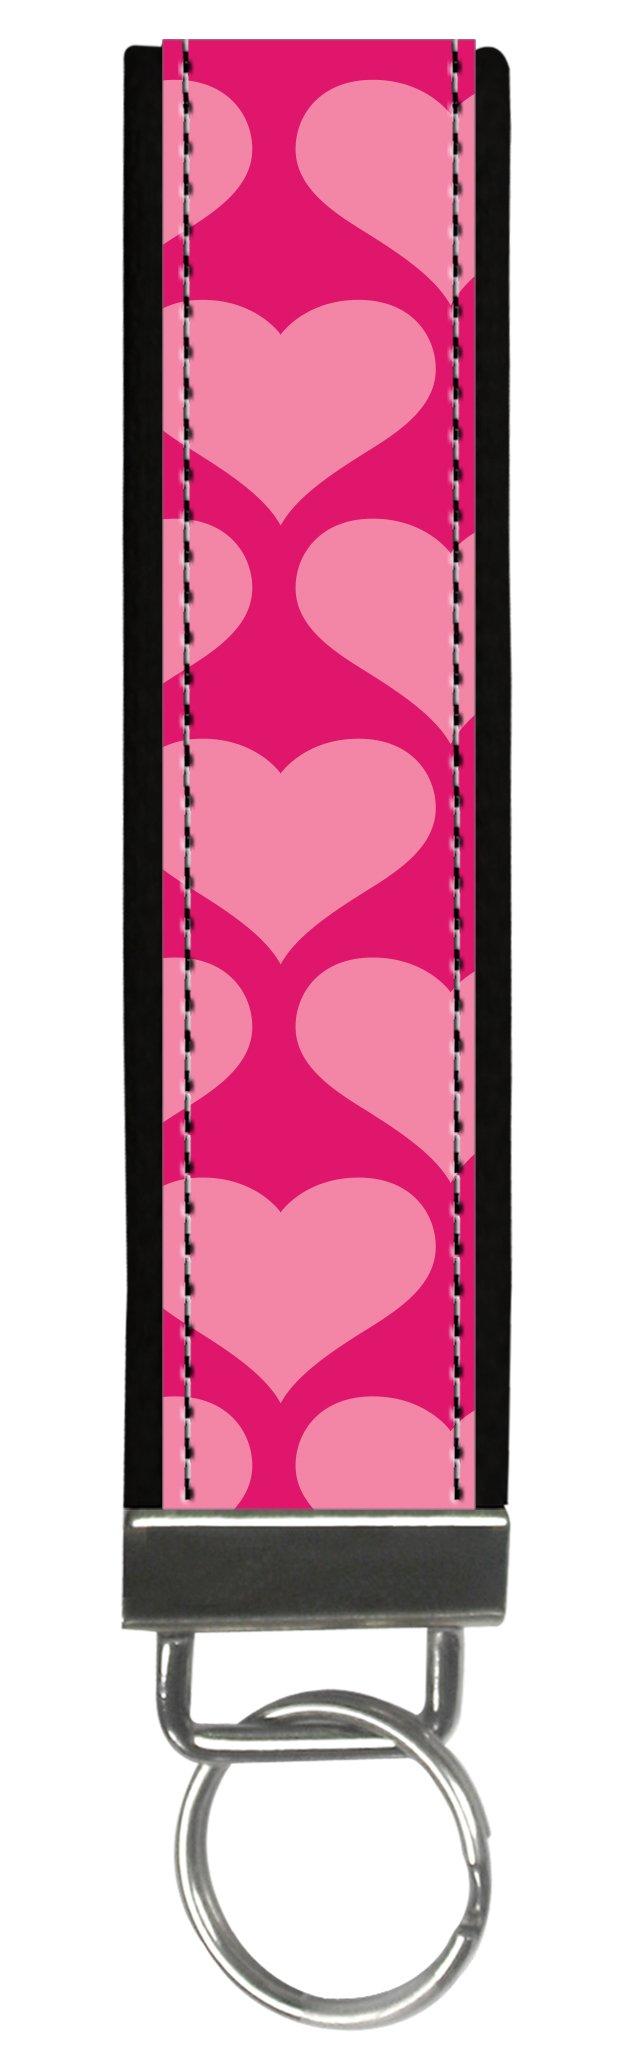 Snaptotes Pink Heart Love Valentine Wristlet Keyfob Keychain